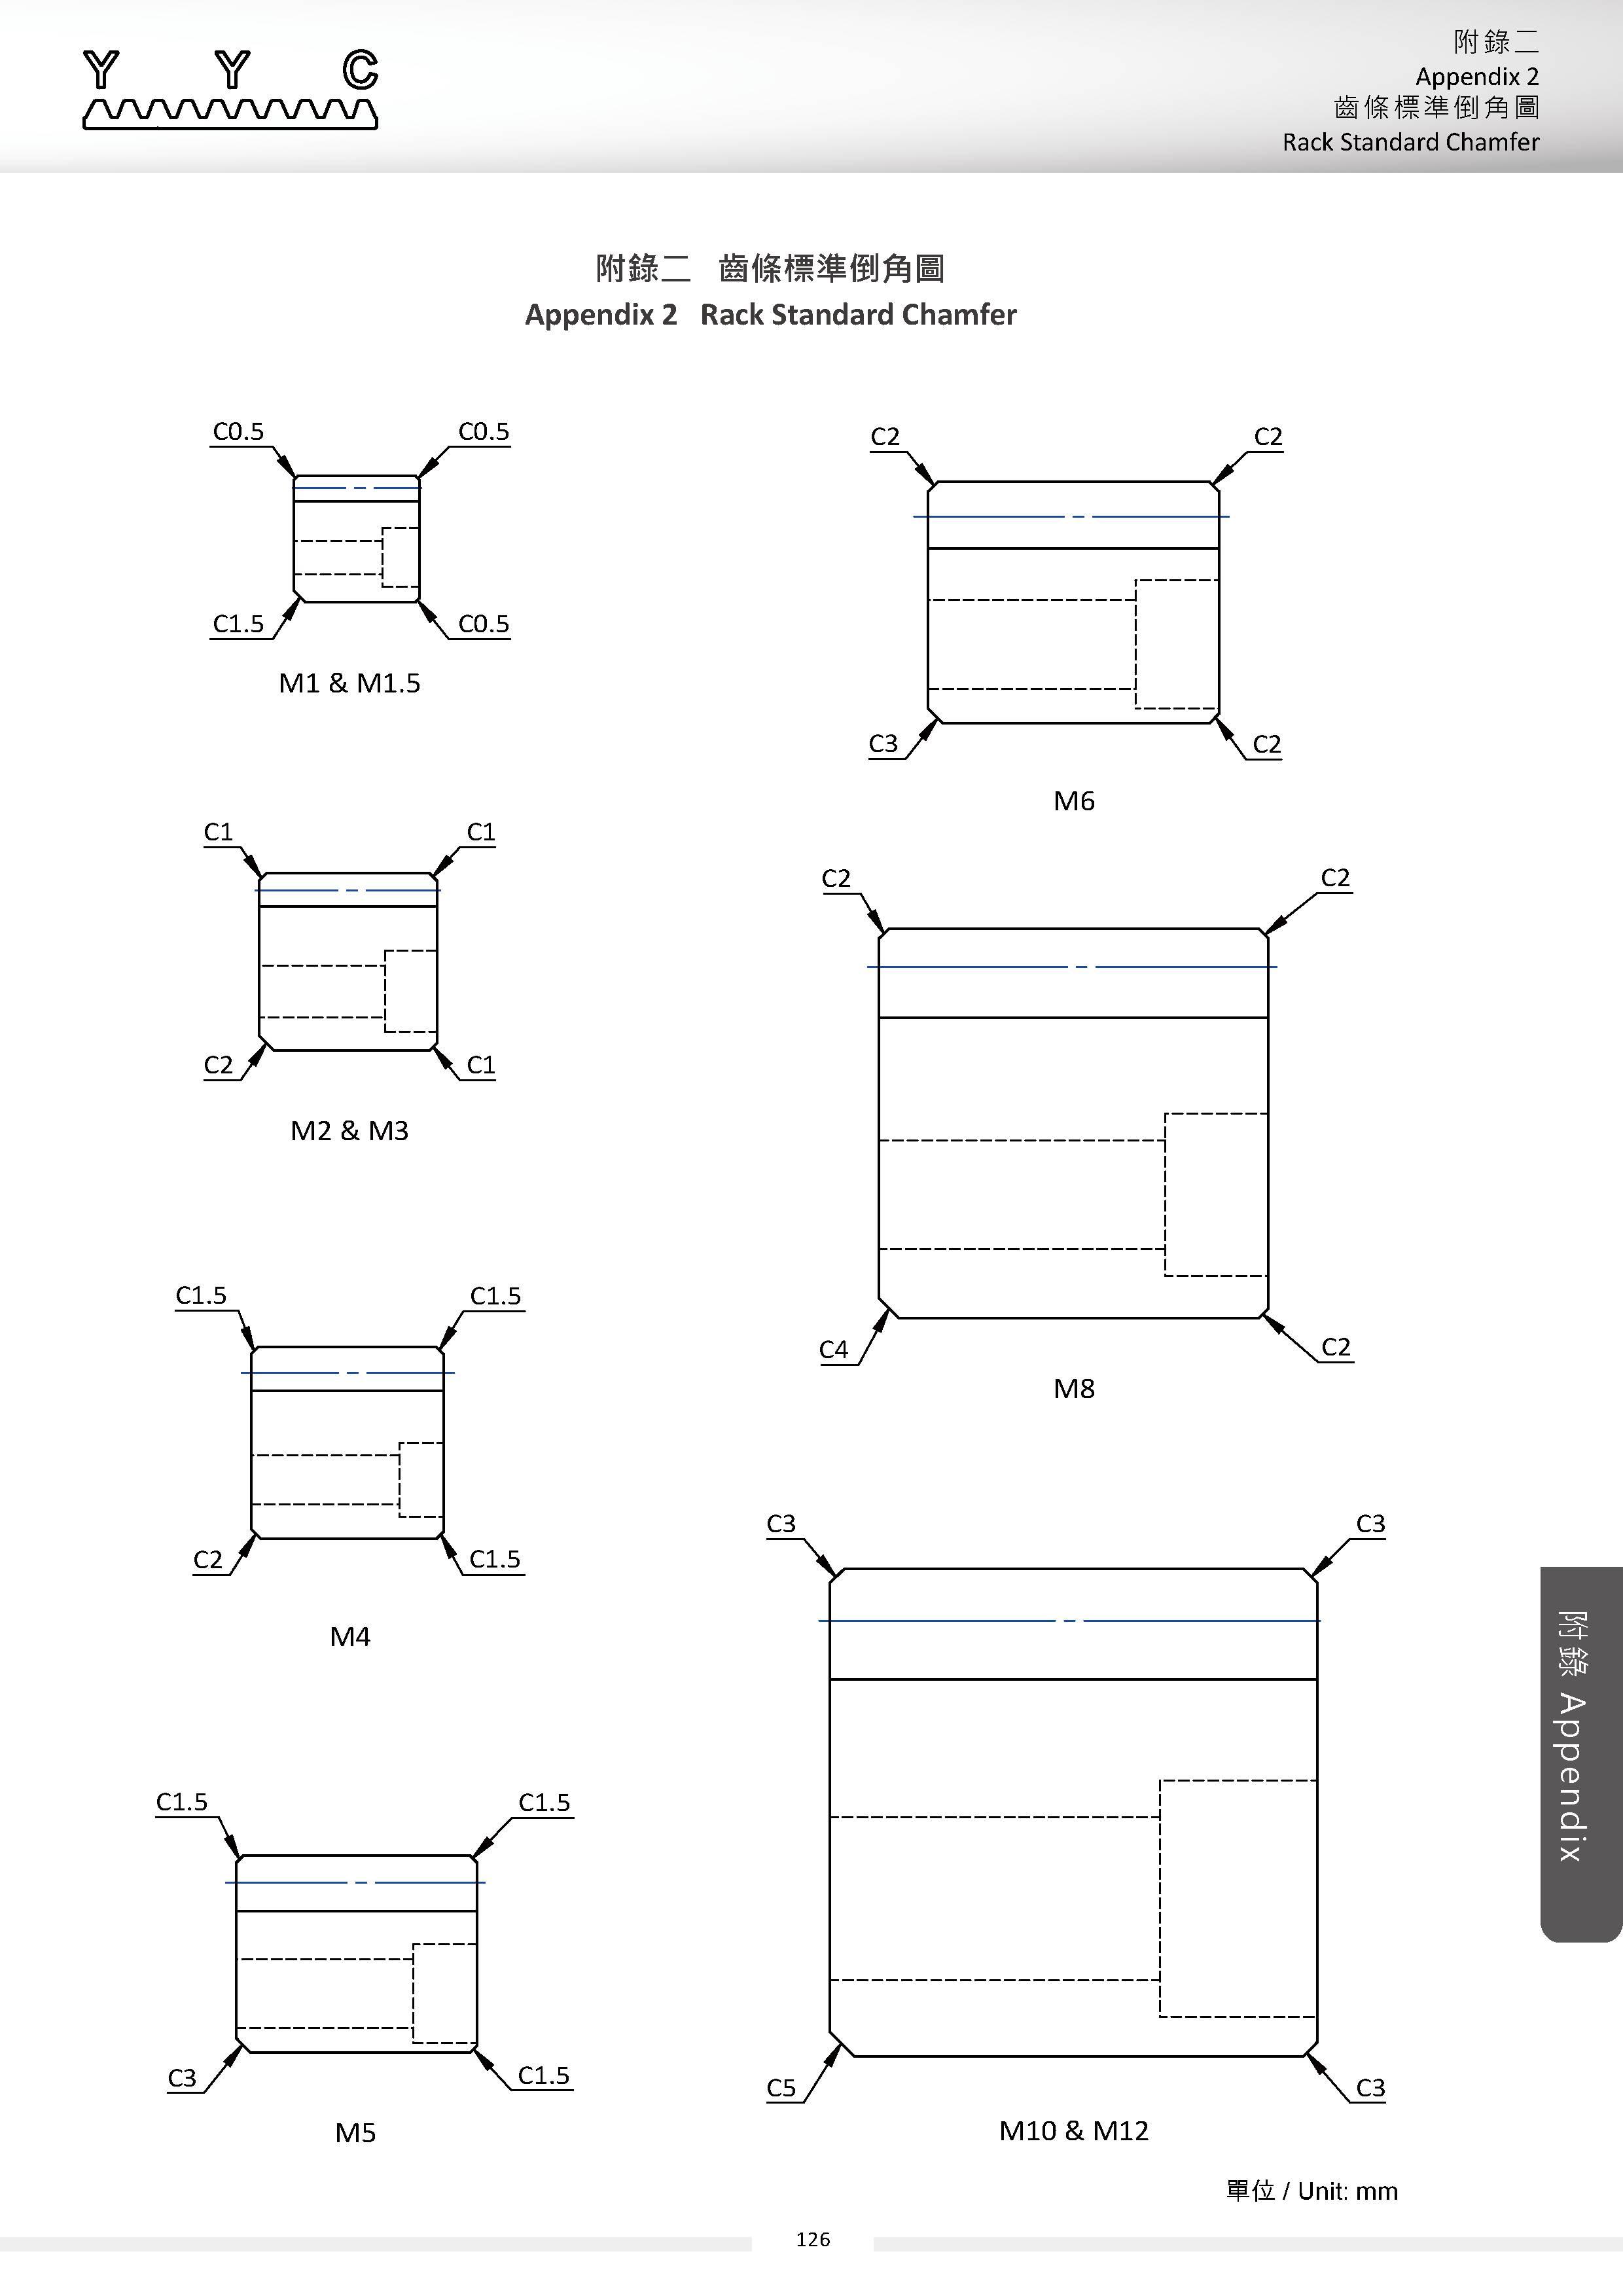 Instruction of Rack Assembly Steps 齒條安裝手冊8